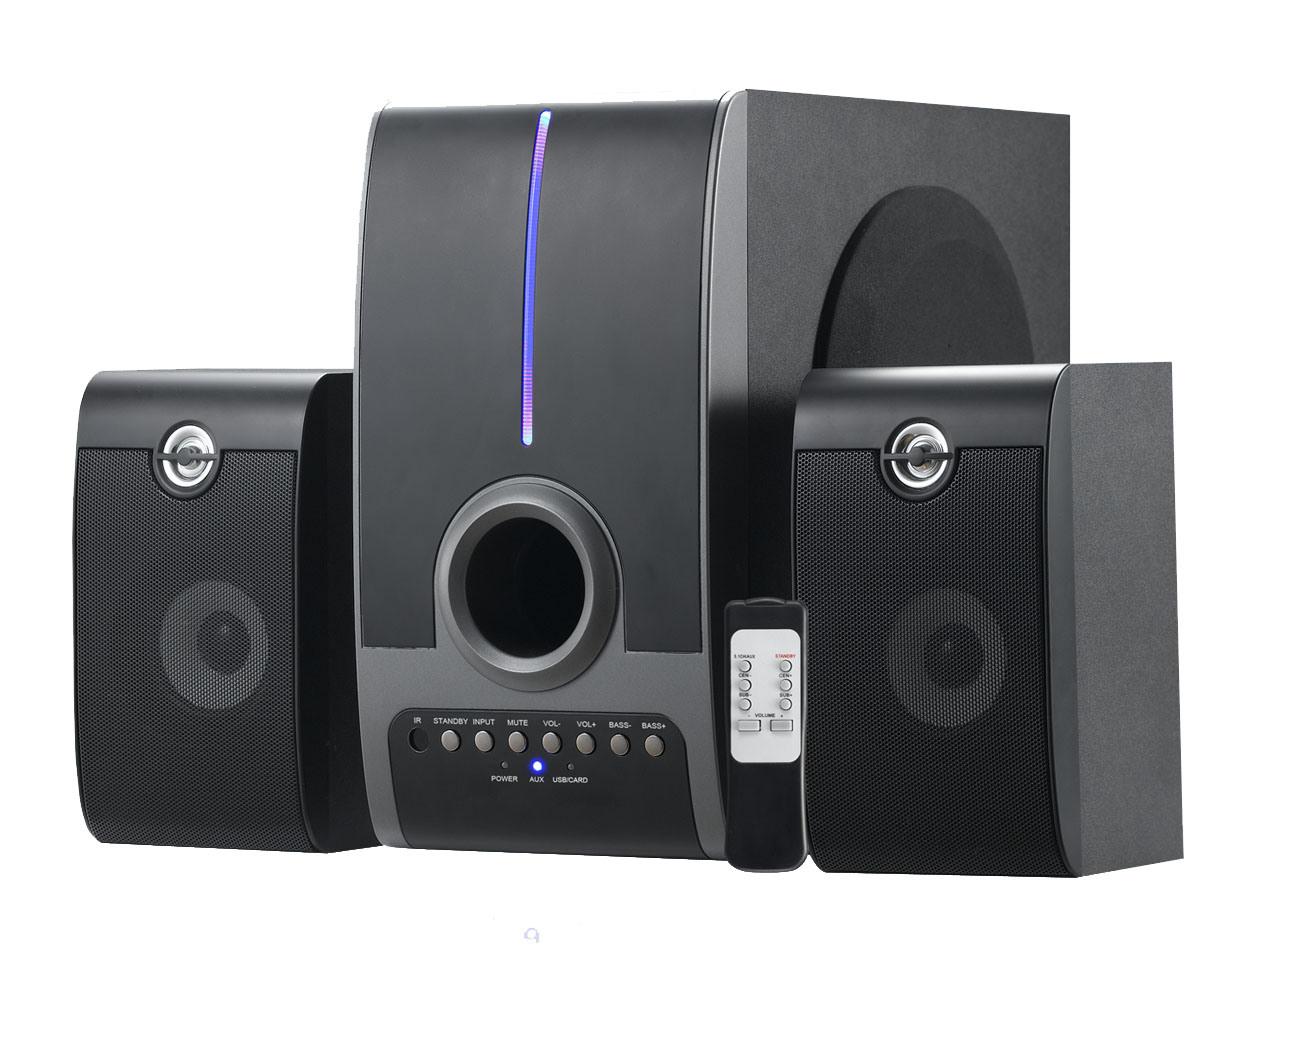 china 2 1 home theater multimedia speaker system la 3006 china speaker 2 1 speaker. Black Bedroom Furniture Sets. Home Design Ideas